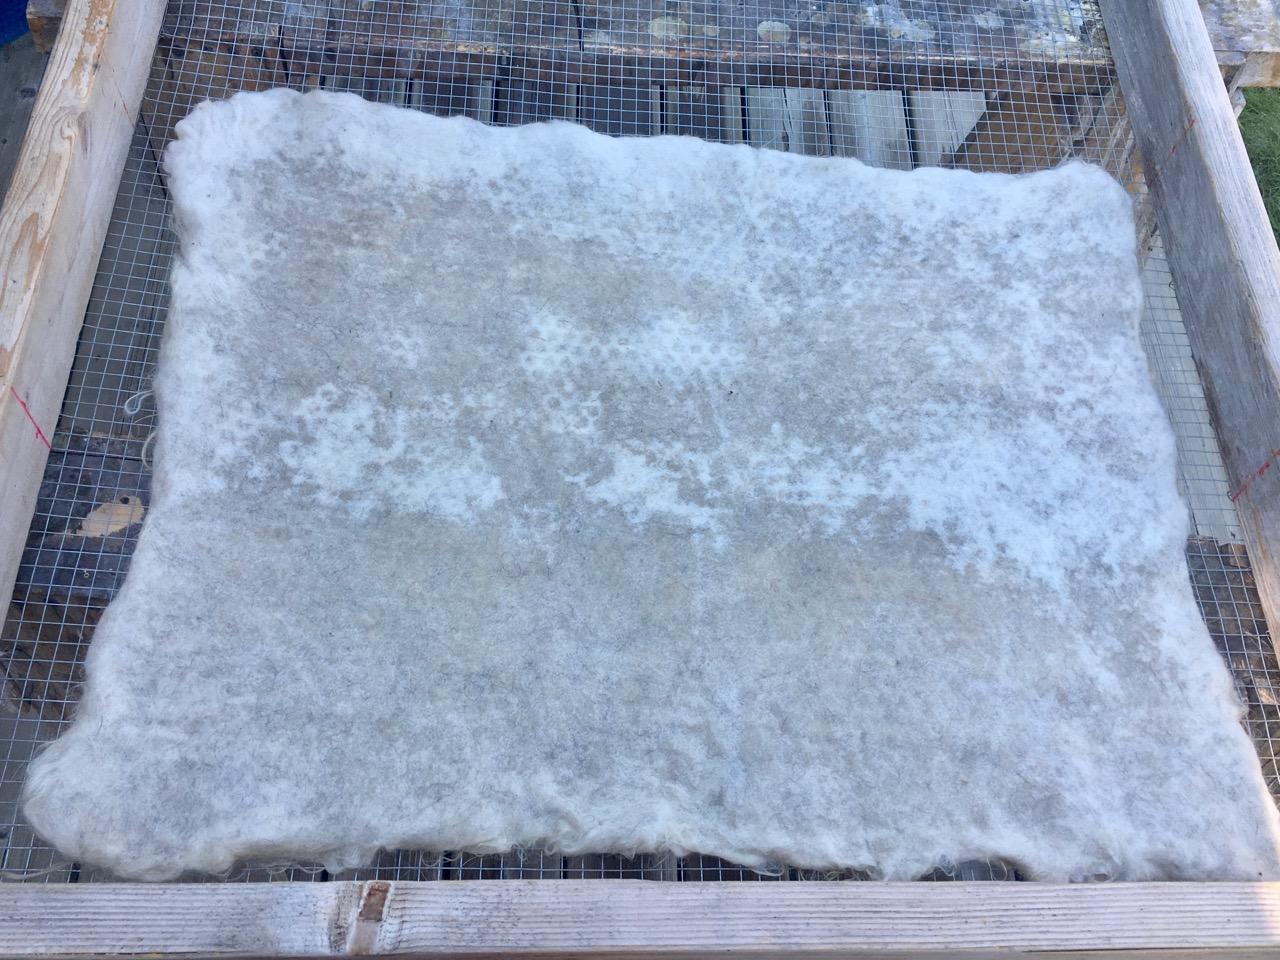 Diy Sheep Crafts How To Make A Felted Fleece Rug Shepherd Like